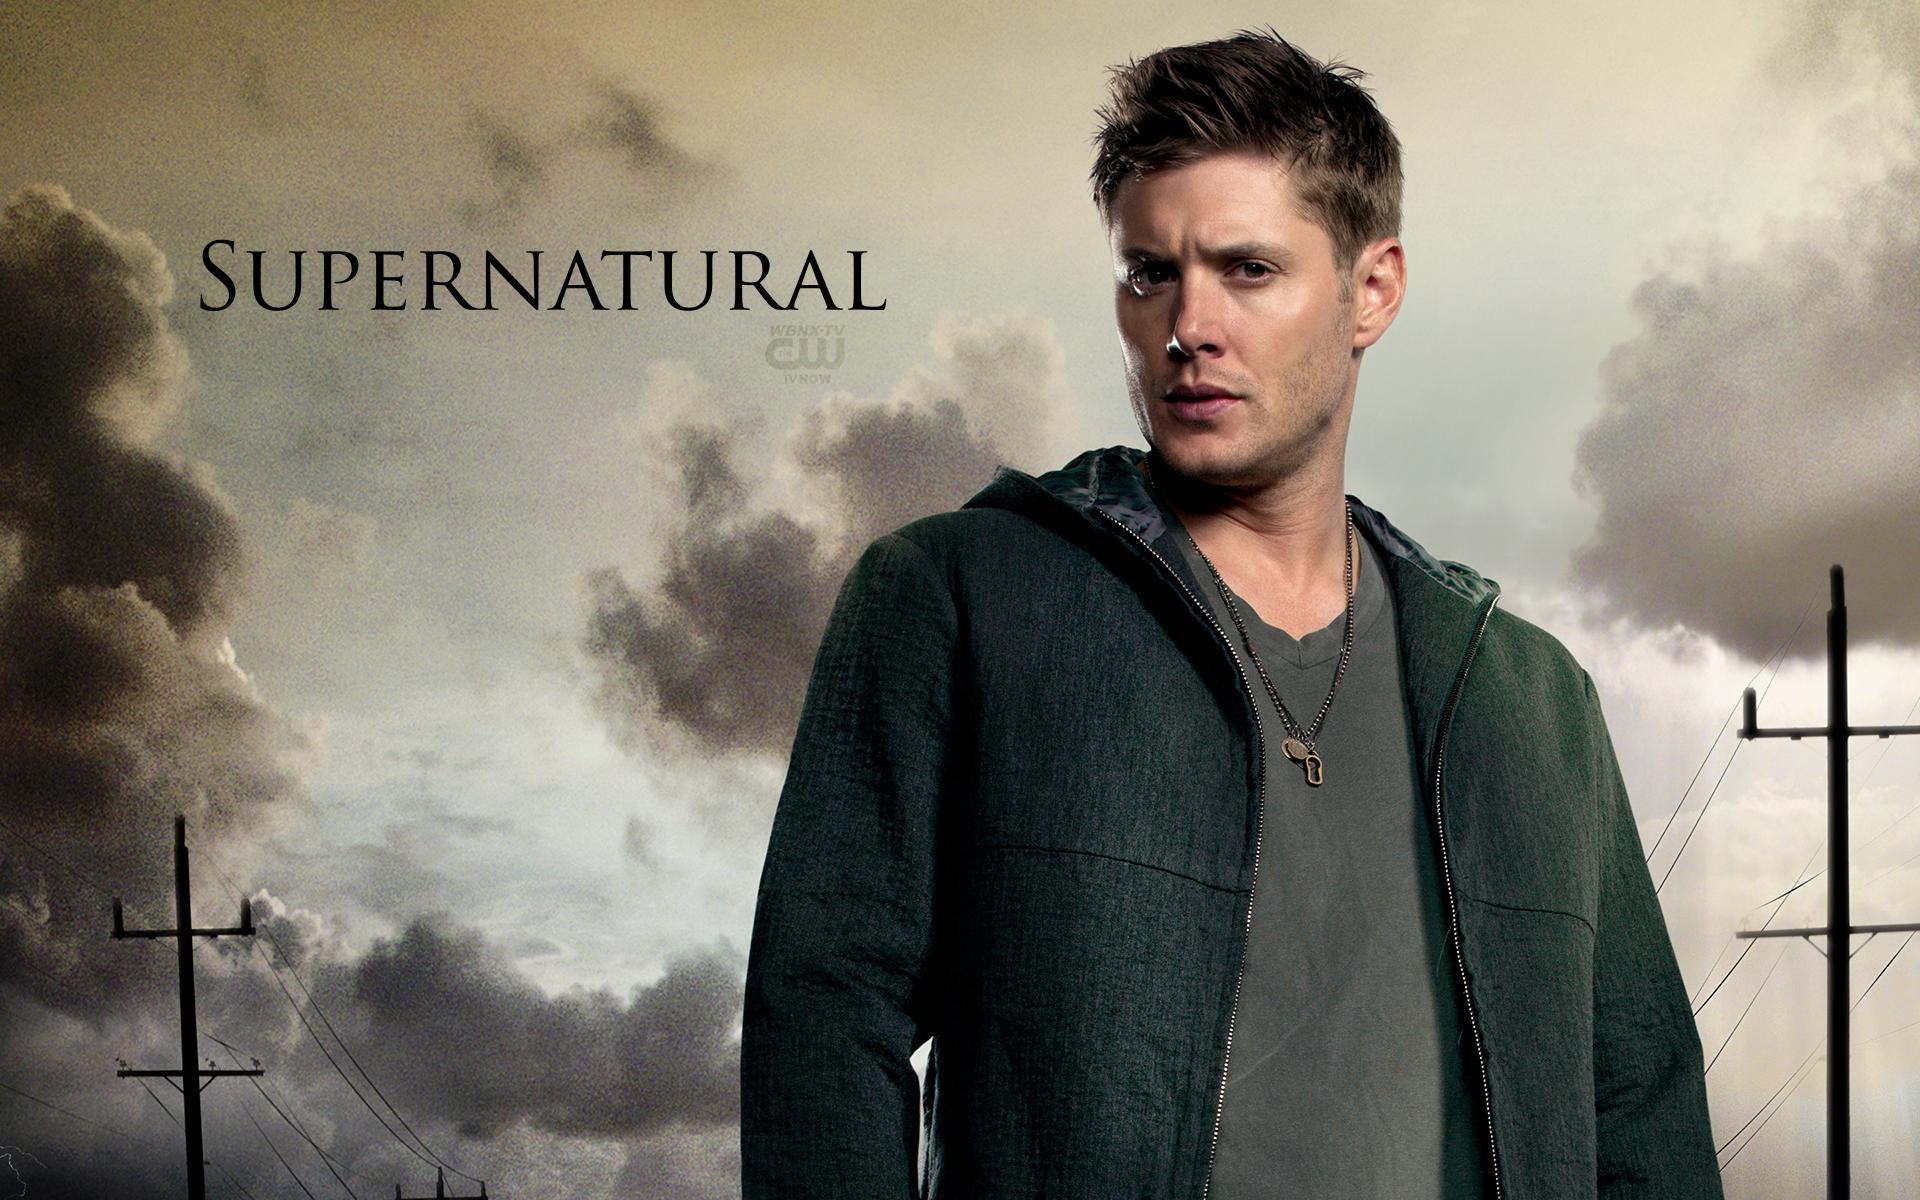 Supernatural-Desktop-Wallpaper